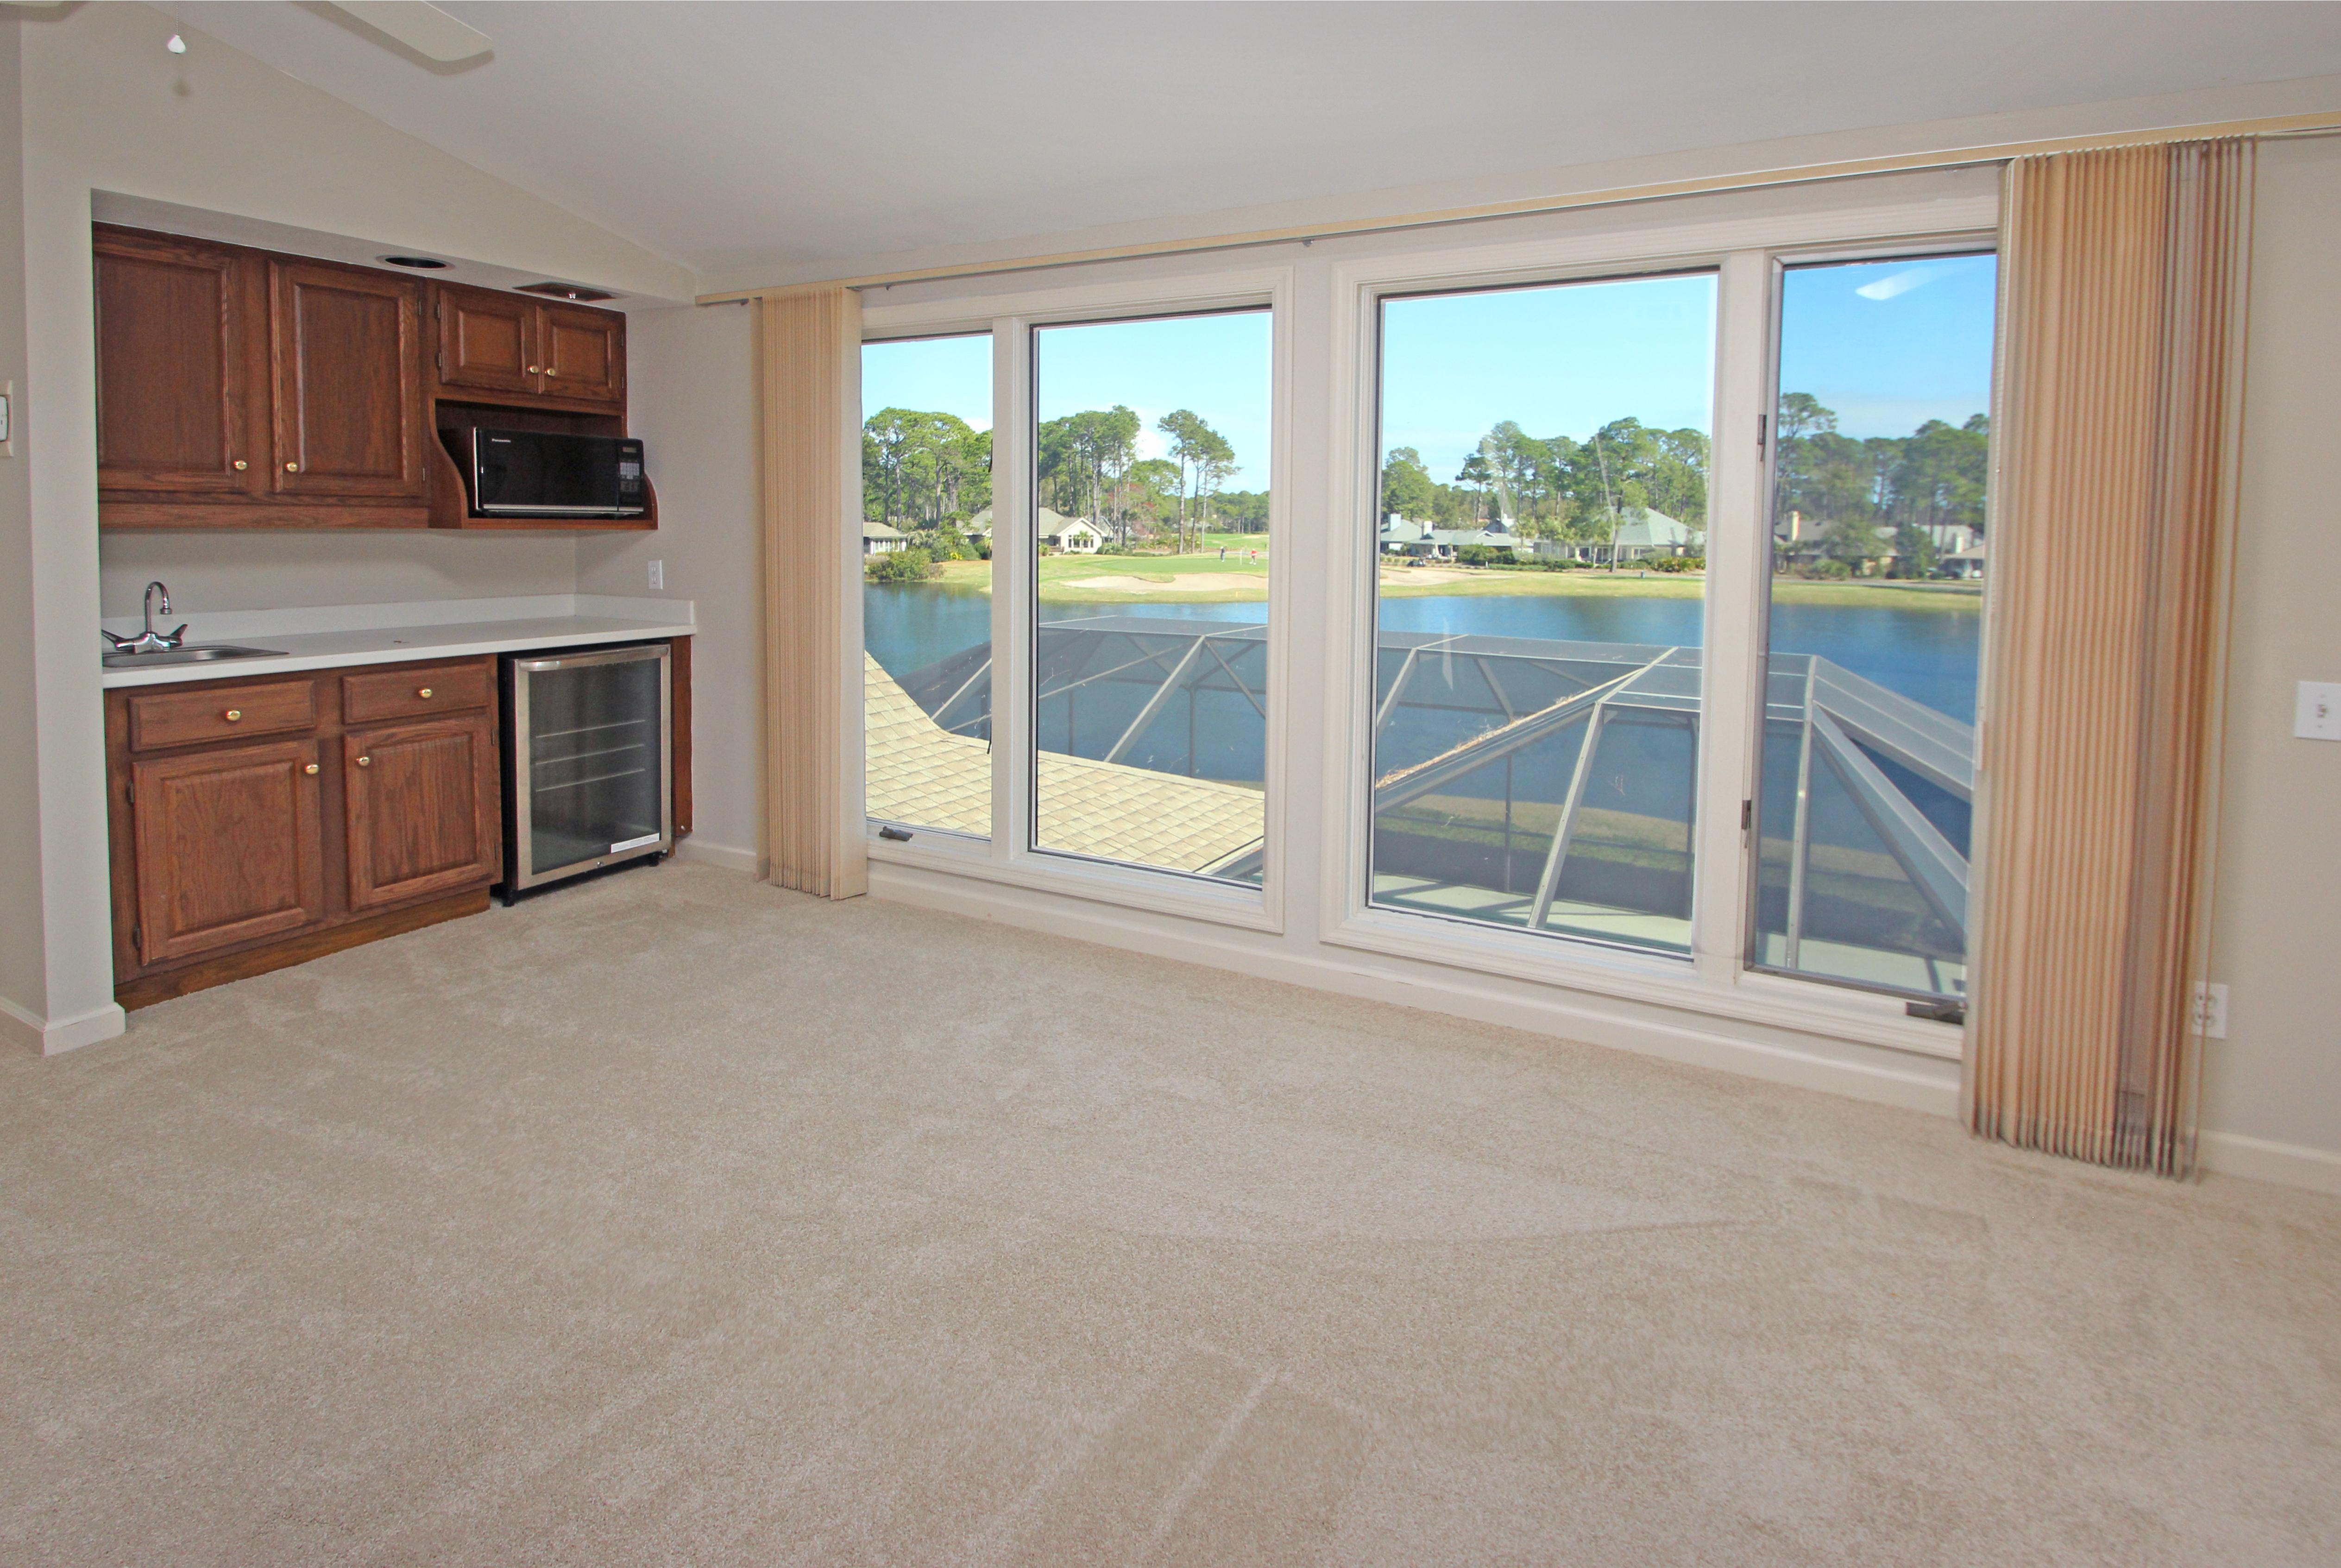 HI - 2nd level living area